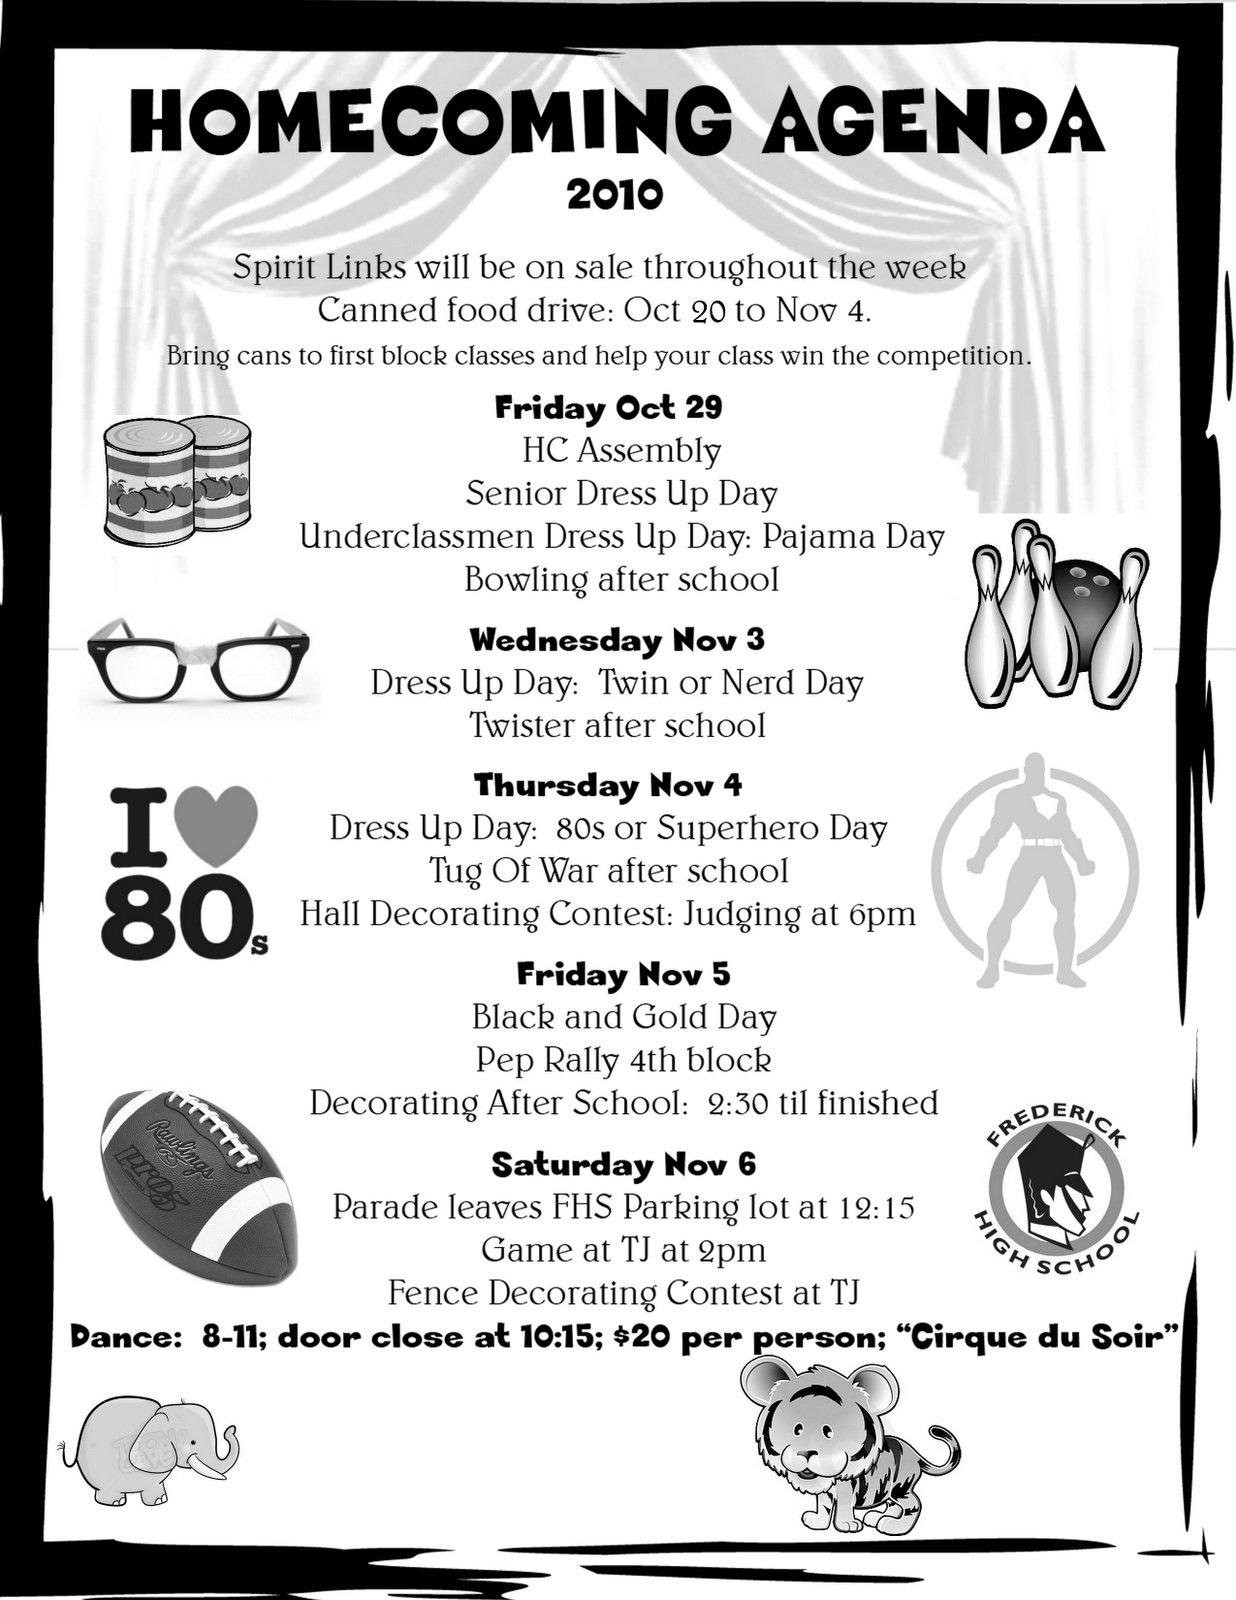 10 Famous Spirit Week Ideas For Middle School homecoming week spirit days student council ideas pinterest 1 2020